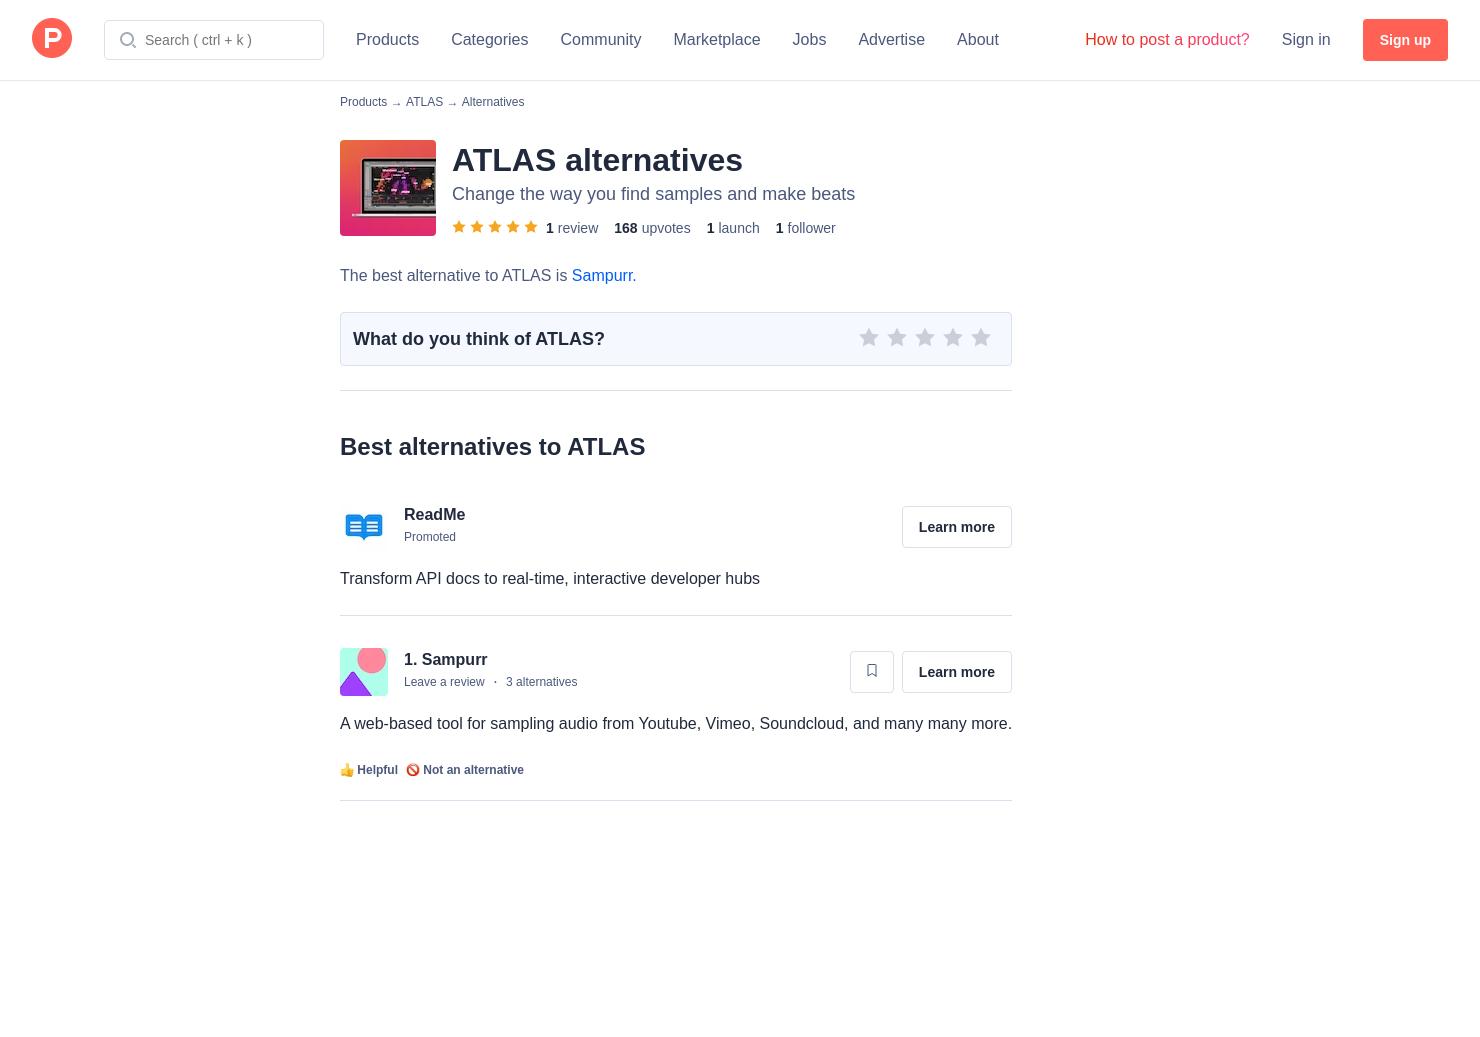 12 Alternatives to ATLAS | Product Hunt